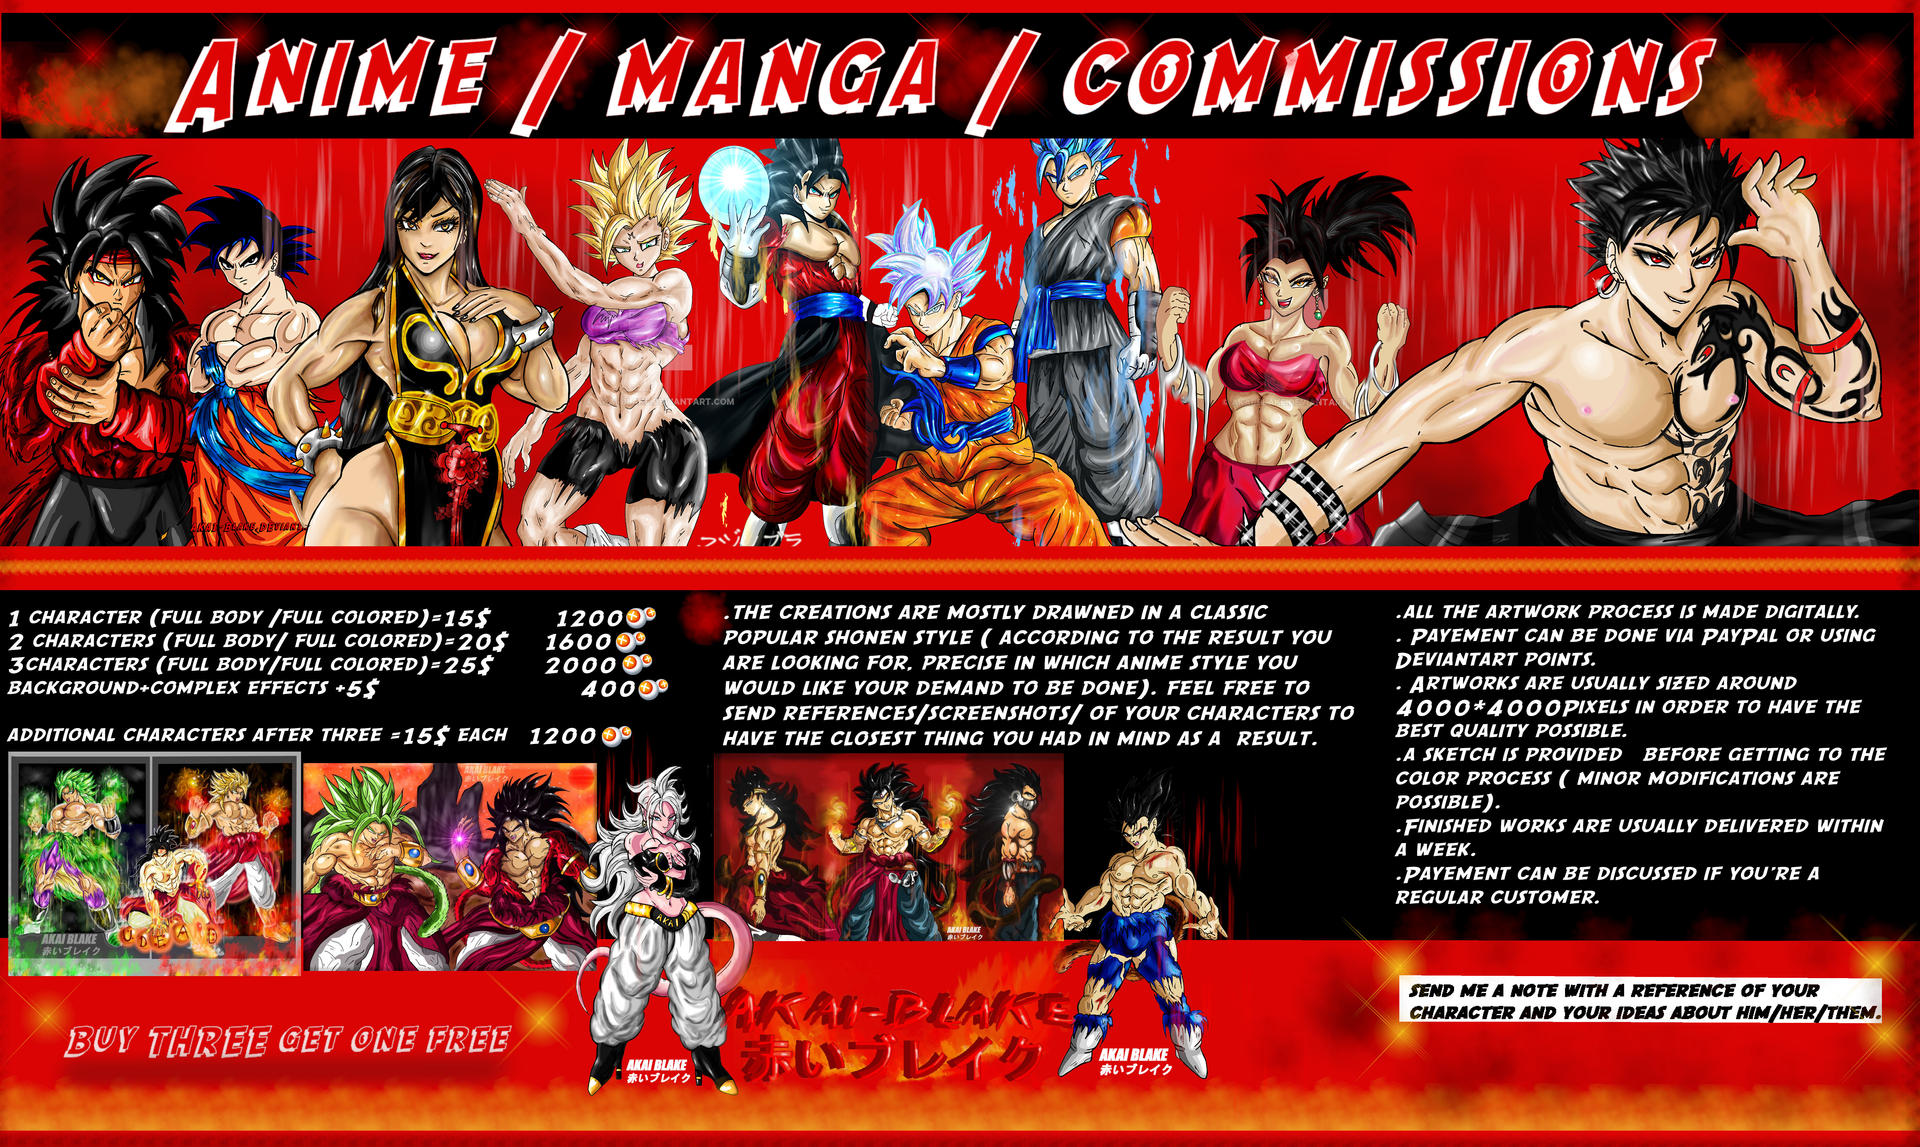 2020 Commissions Info